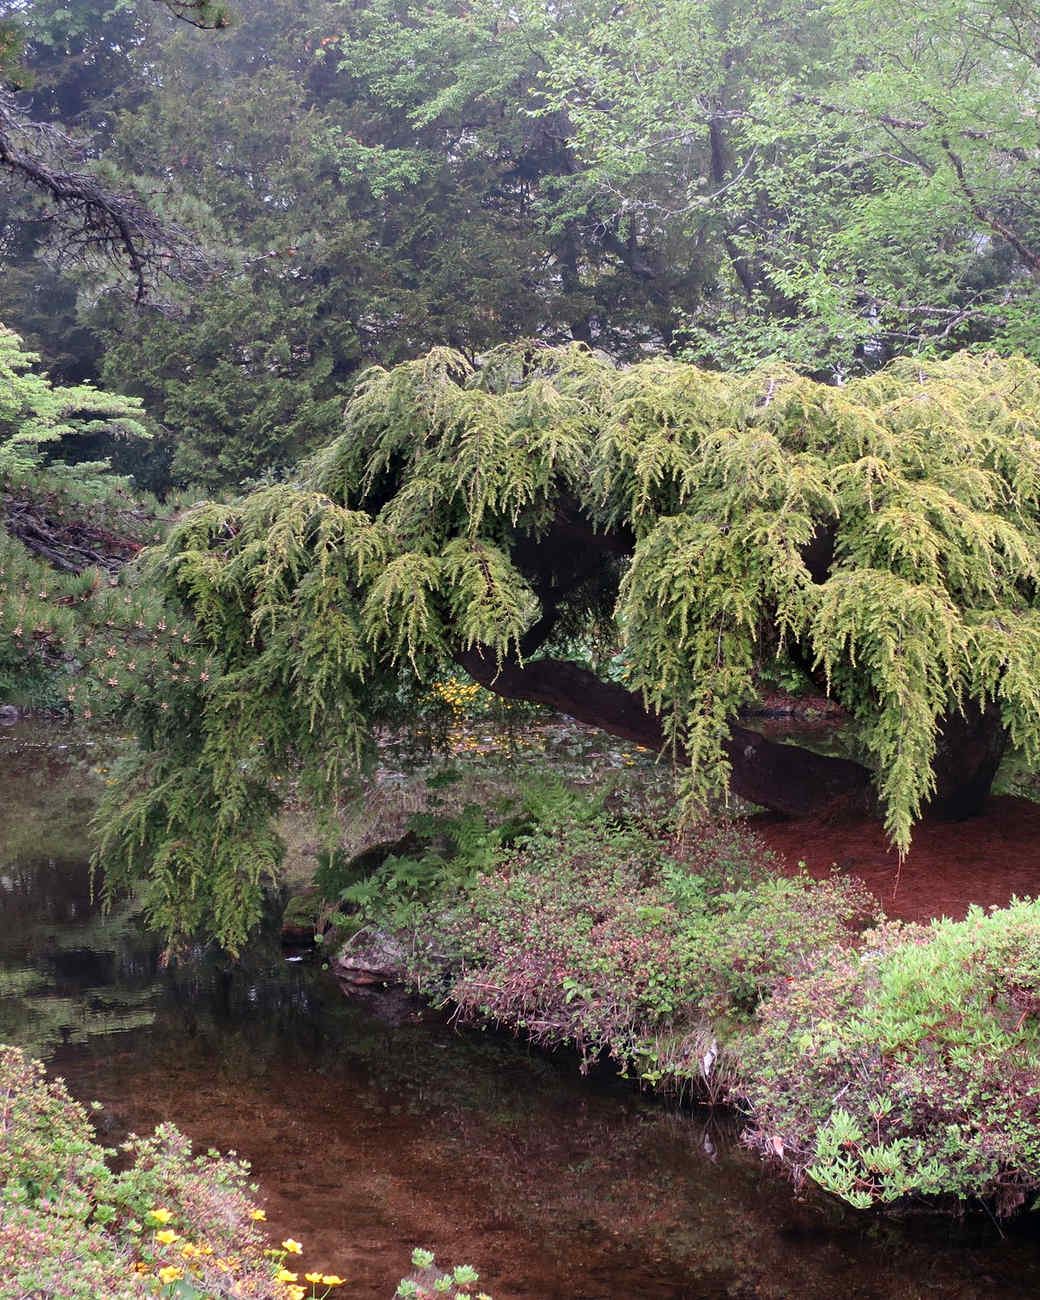 asticou-azalea-gardens-31-0615.jpg